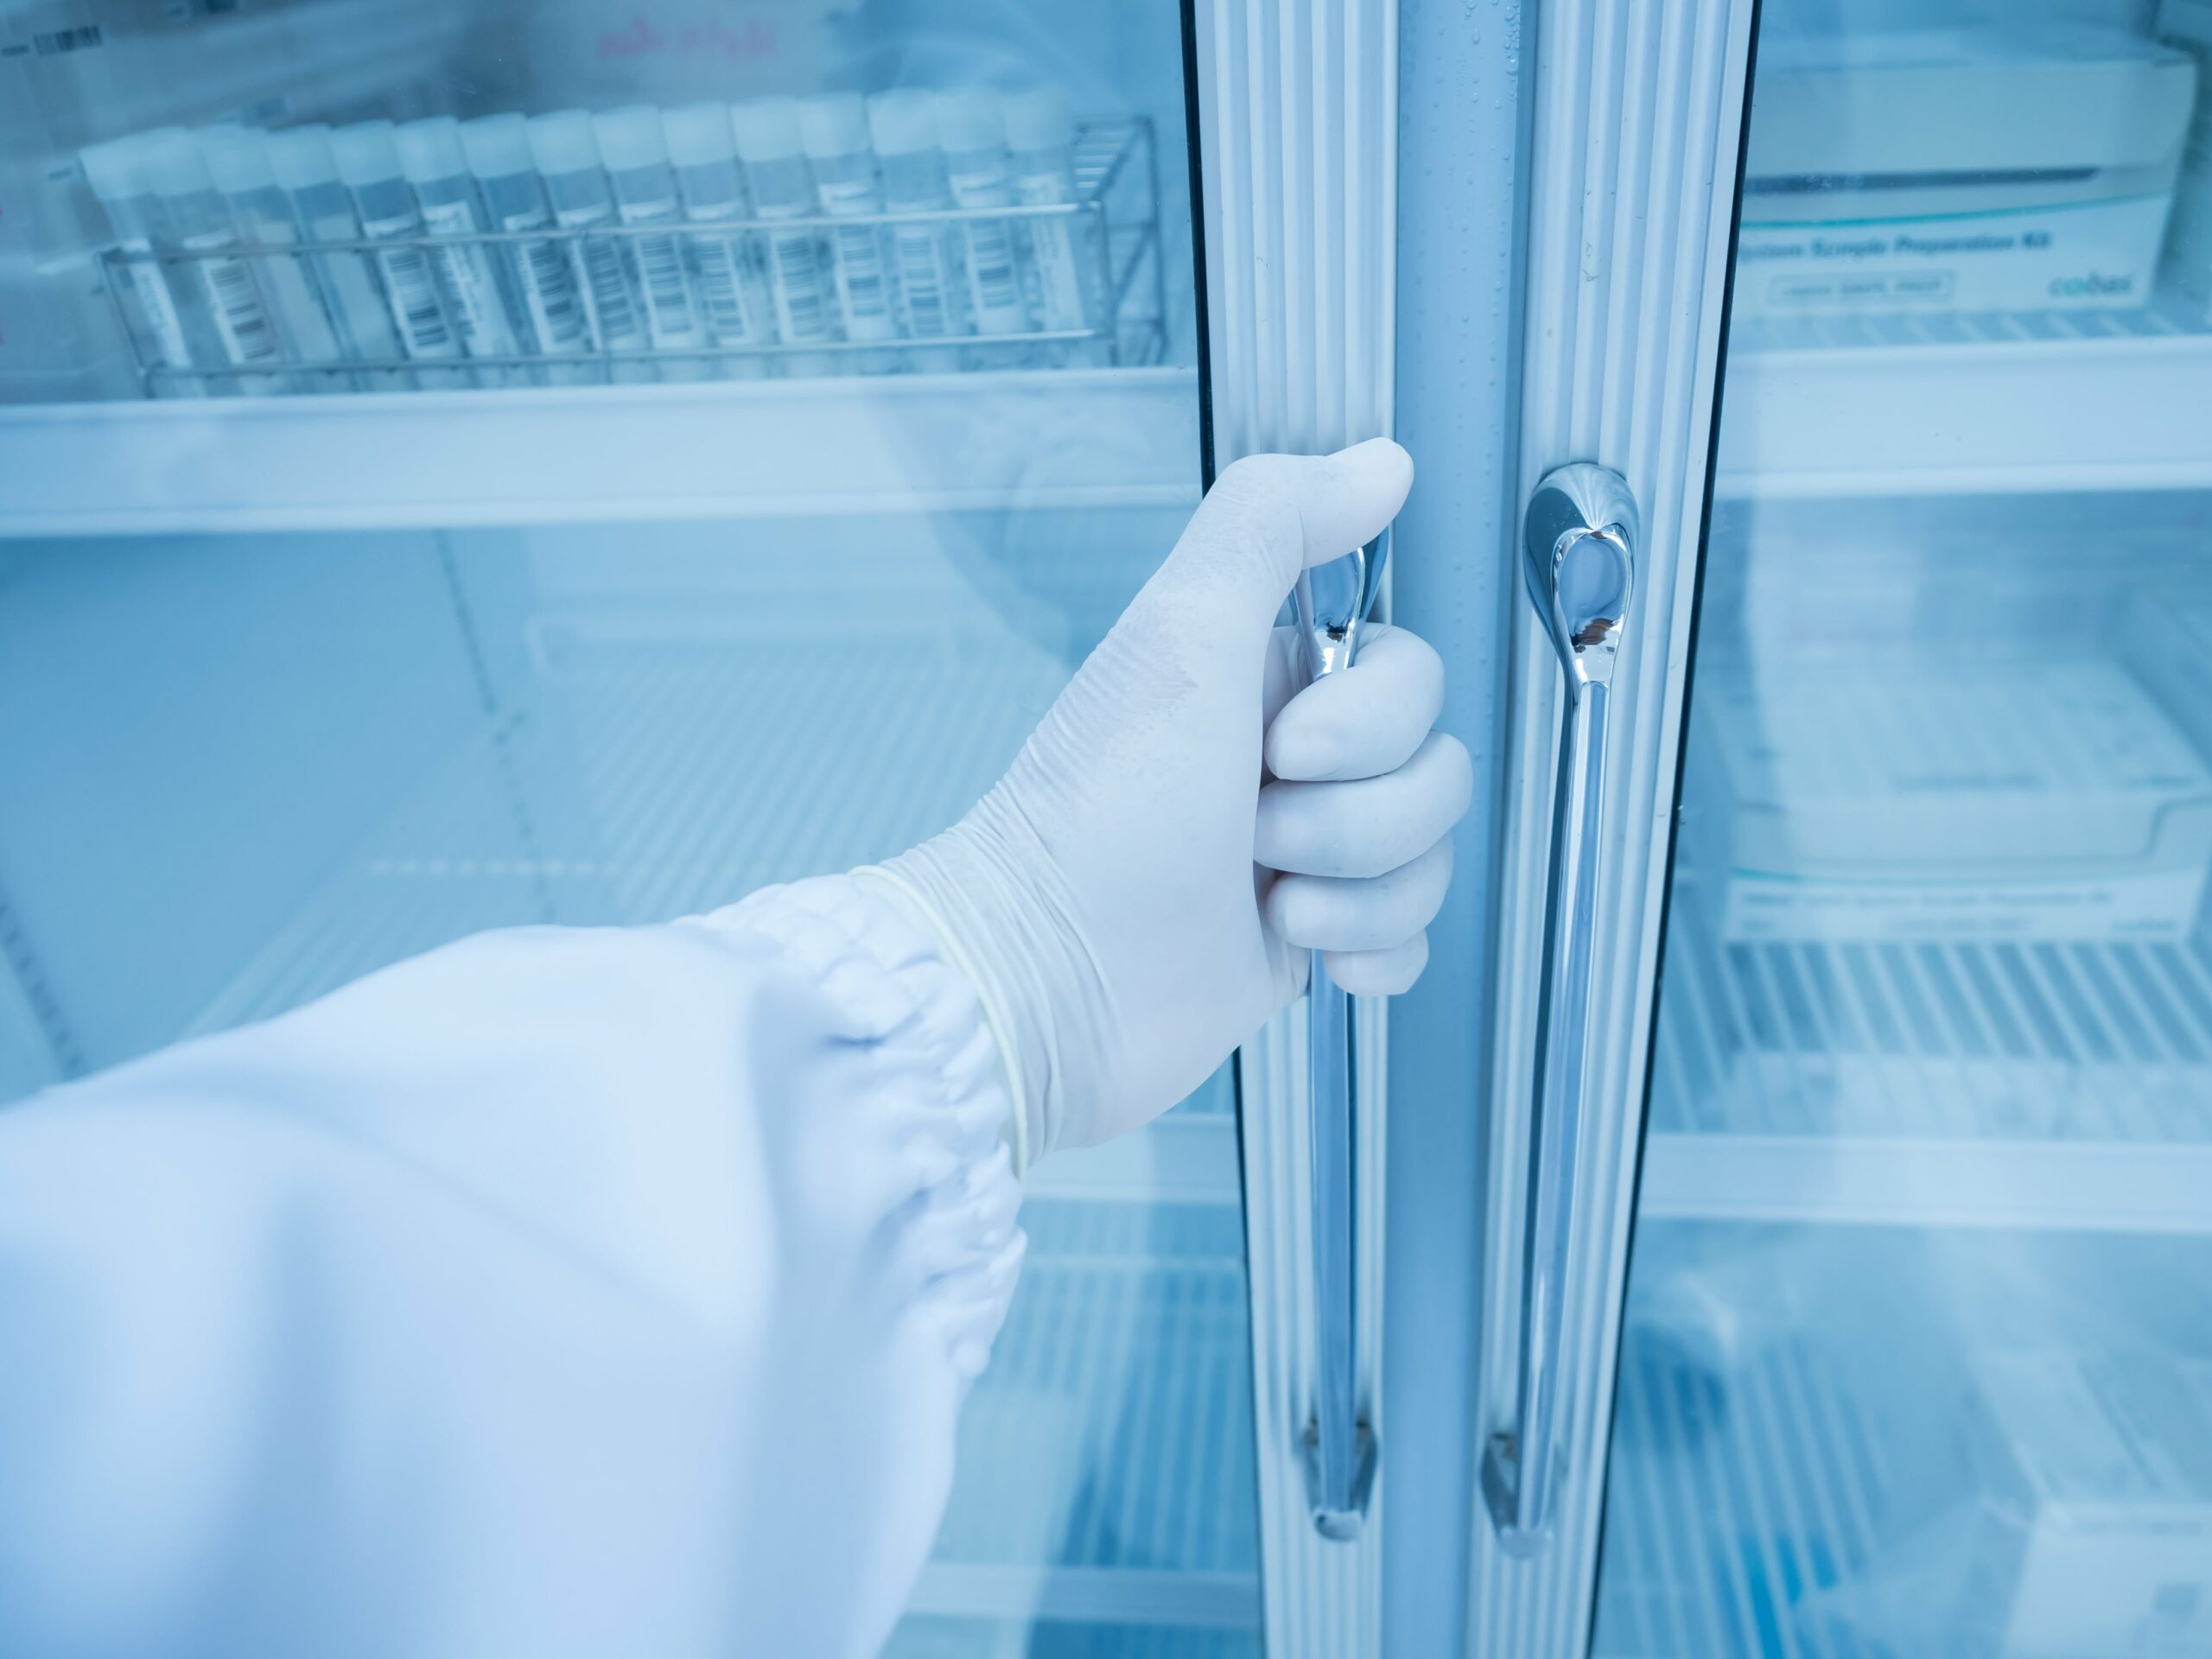 Refrigerated vaccines